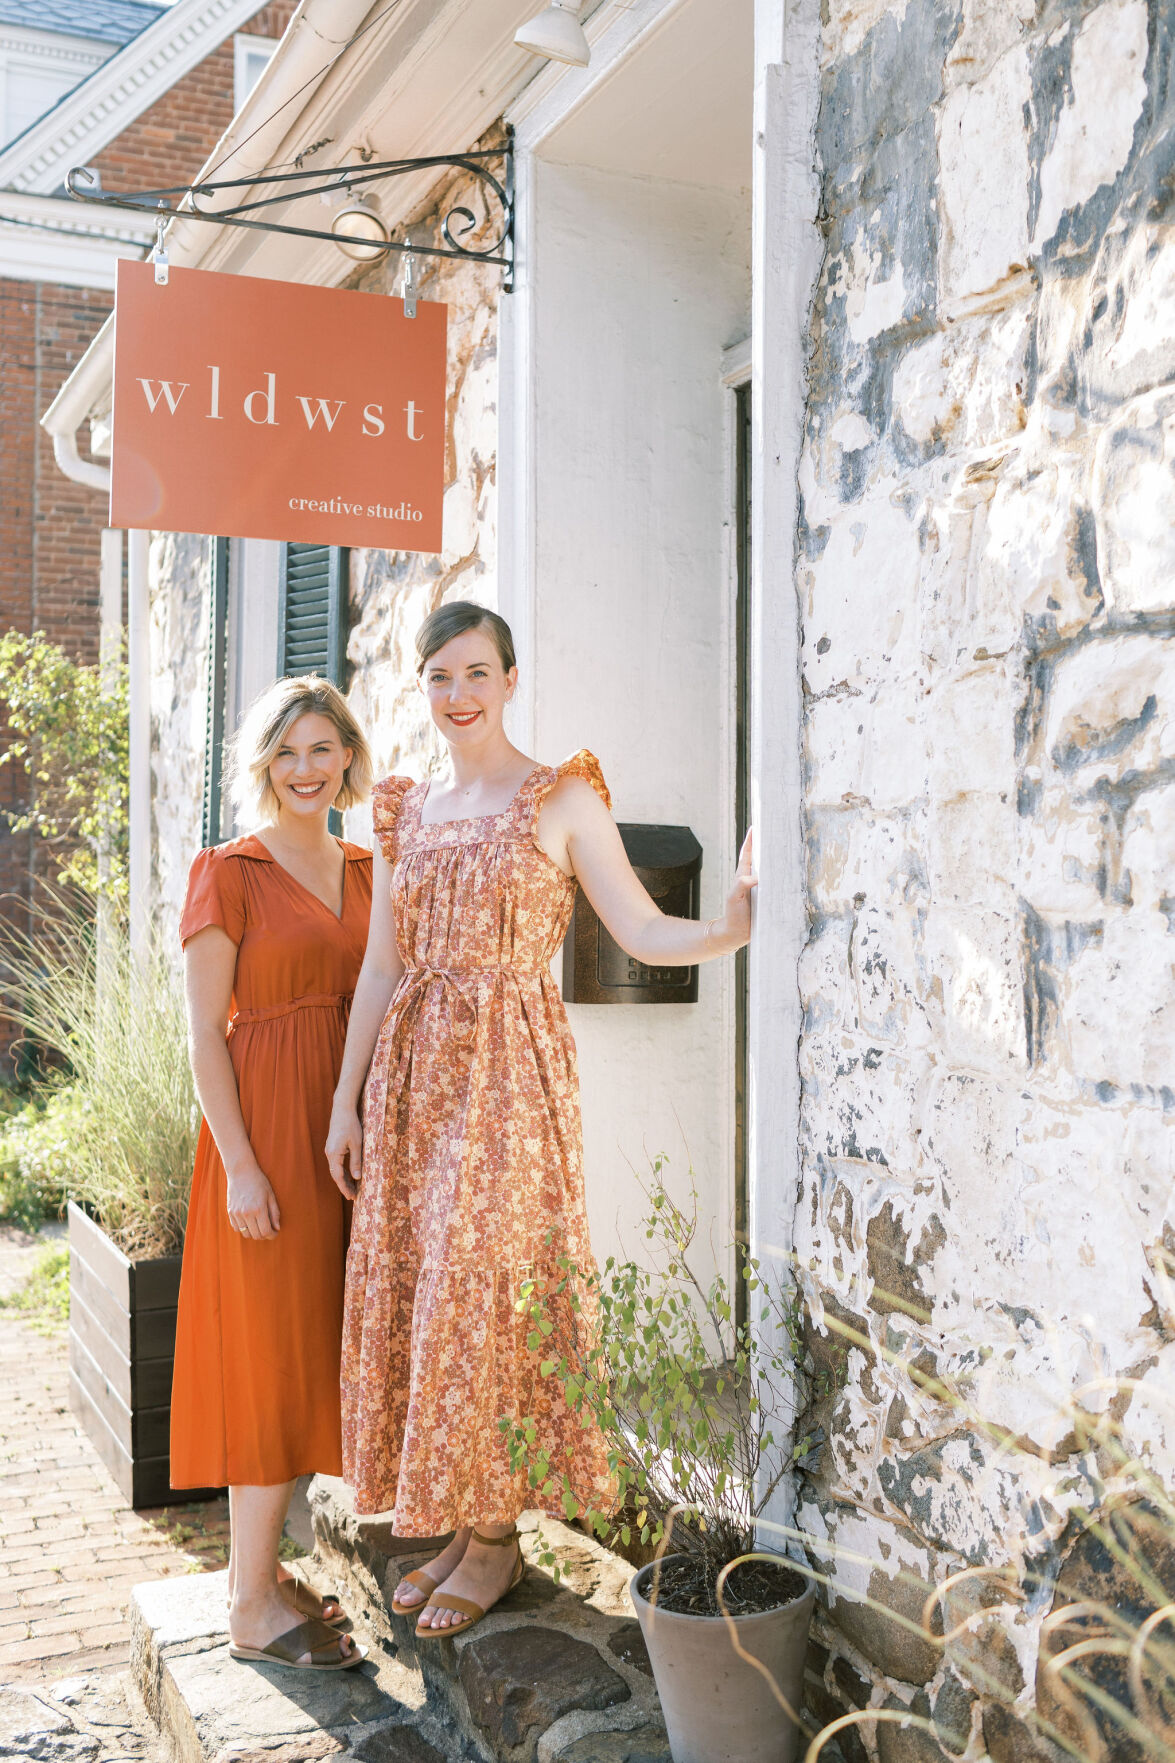 Loudoun Street in Leesburg welcomes three new shops